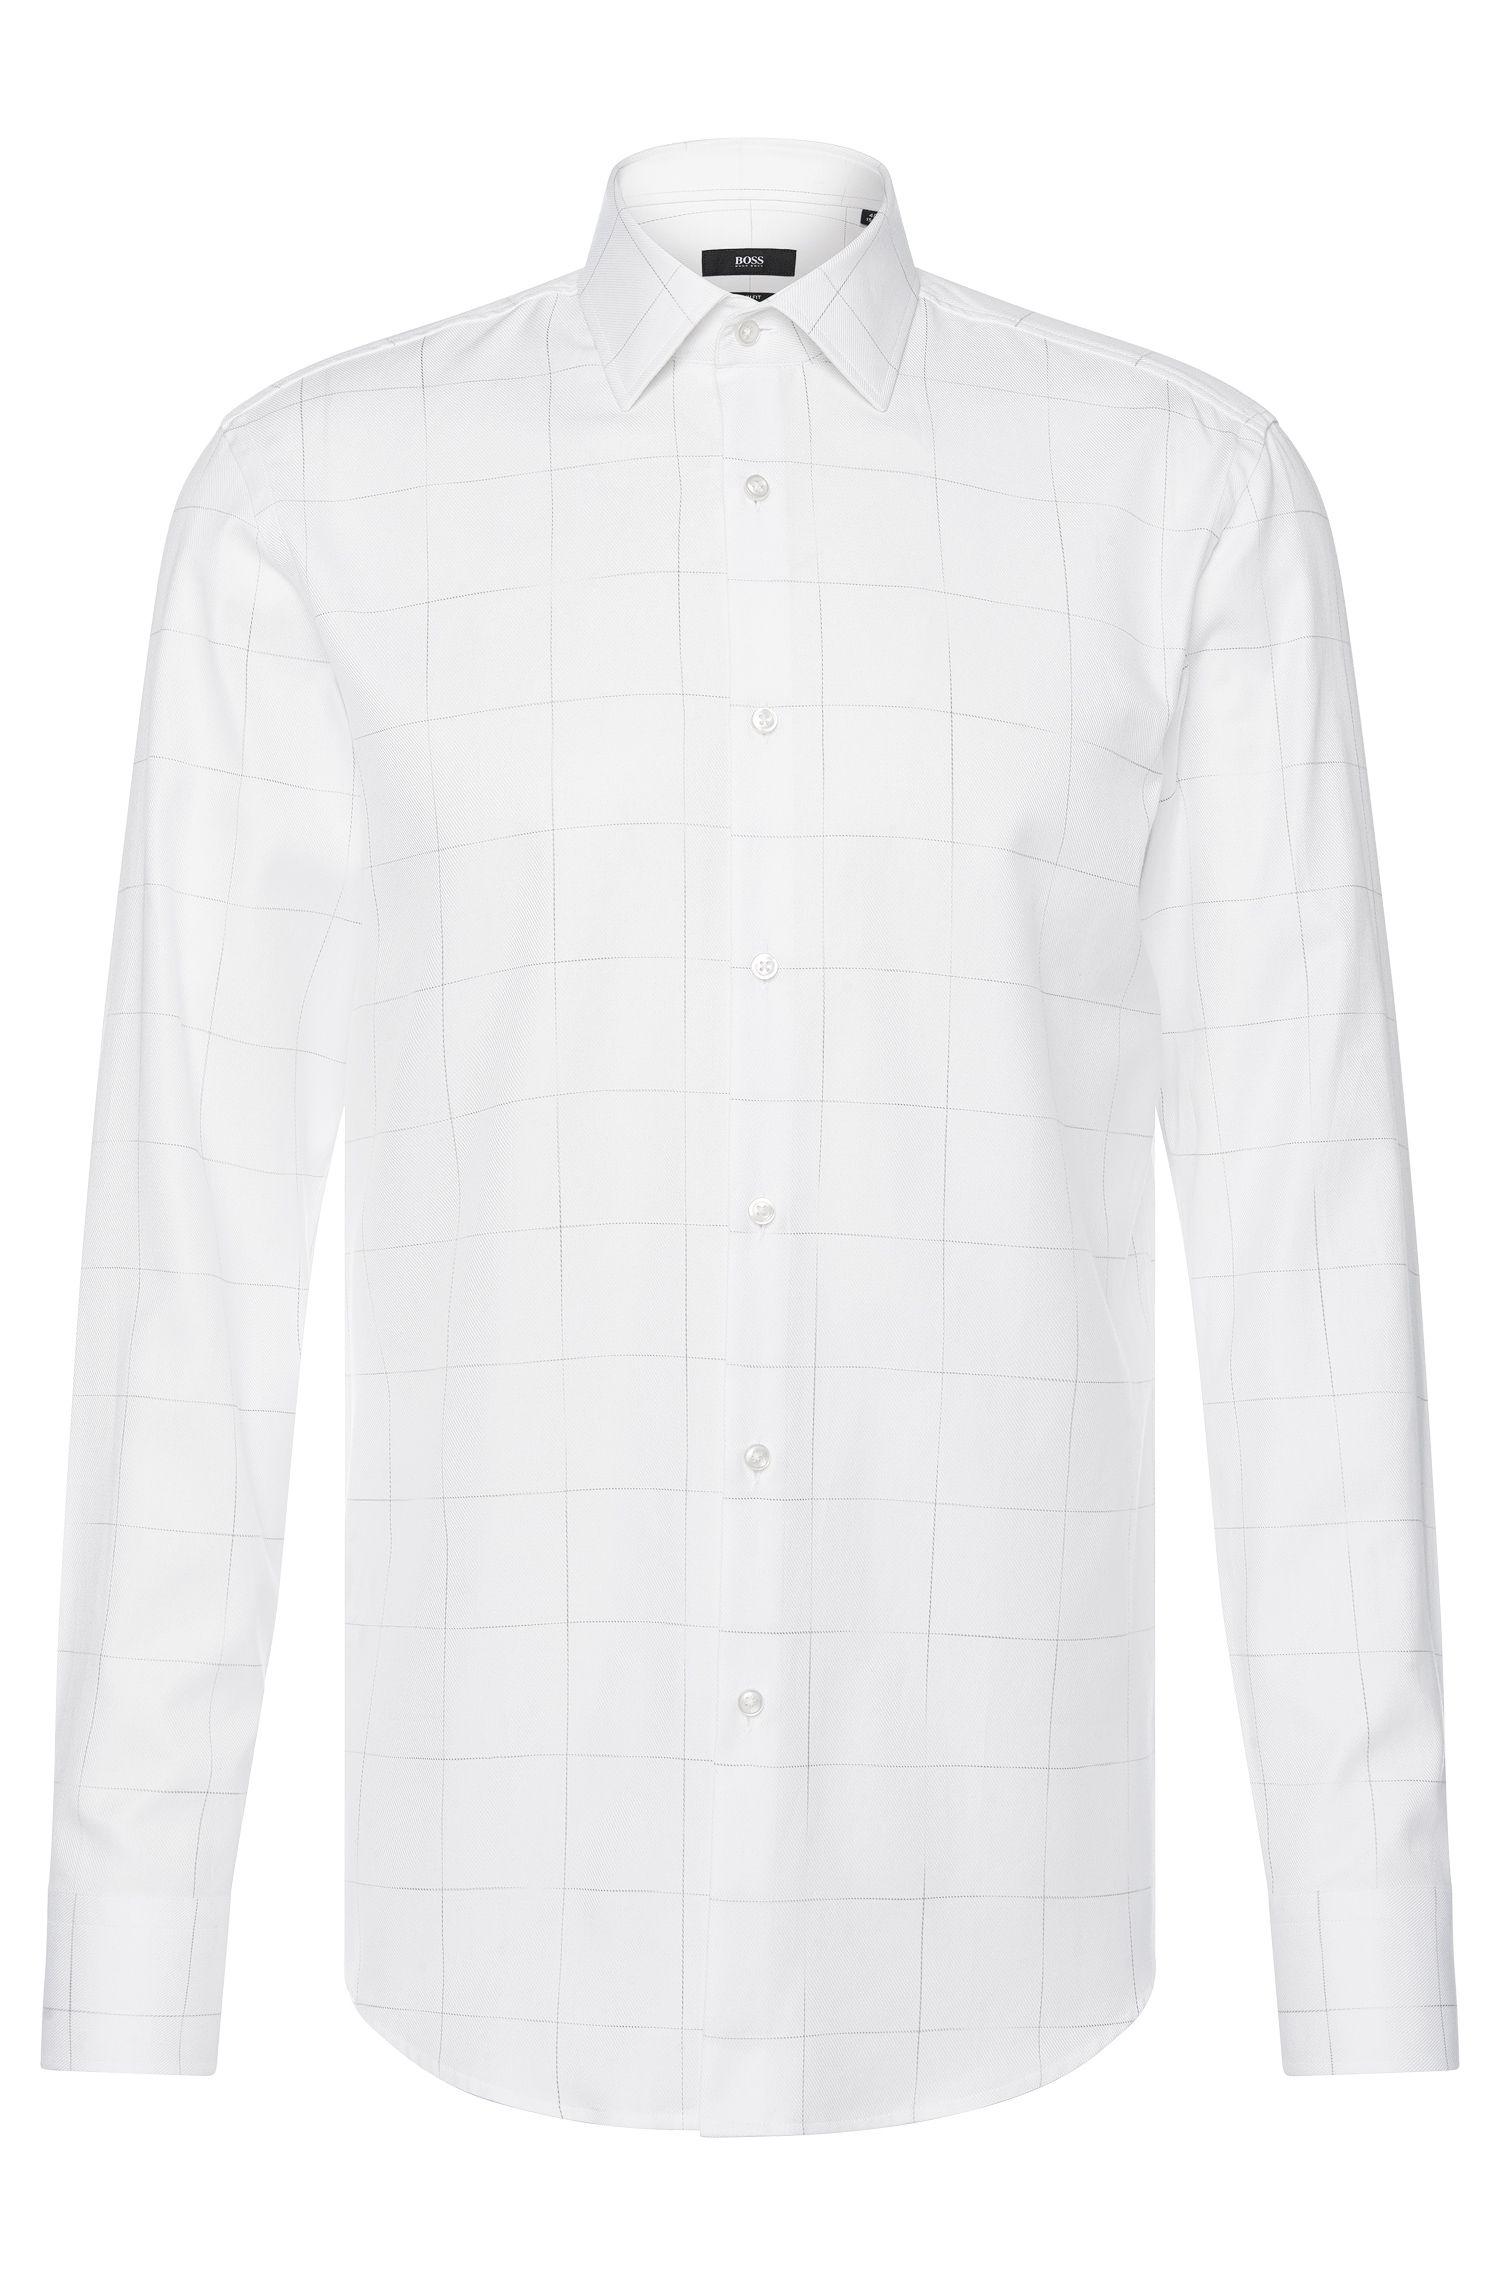 Kariertes Slim-Fit Hemd aus Baumwolle: 'Jenno'